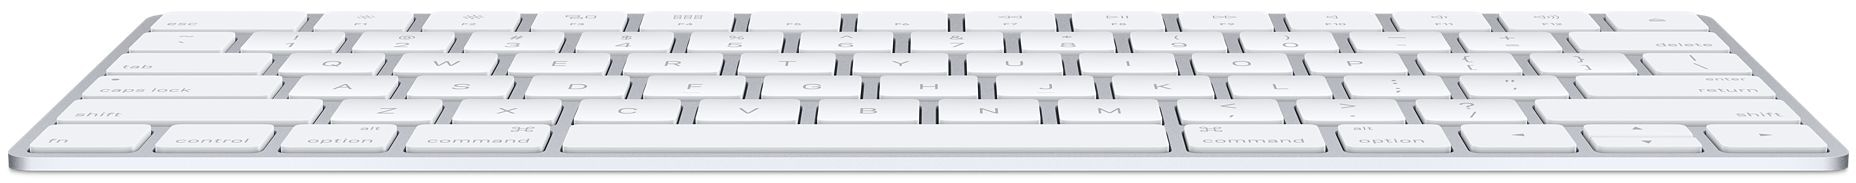 Apple - Magic Keyboard